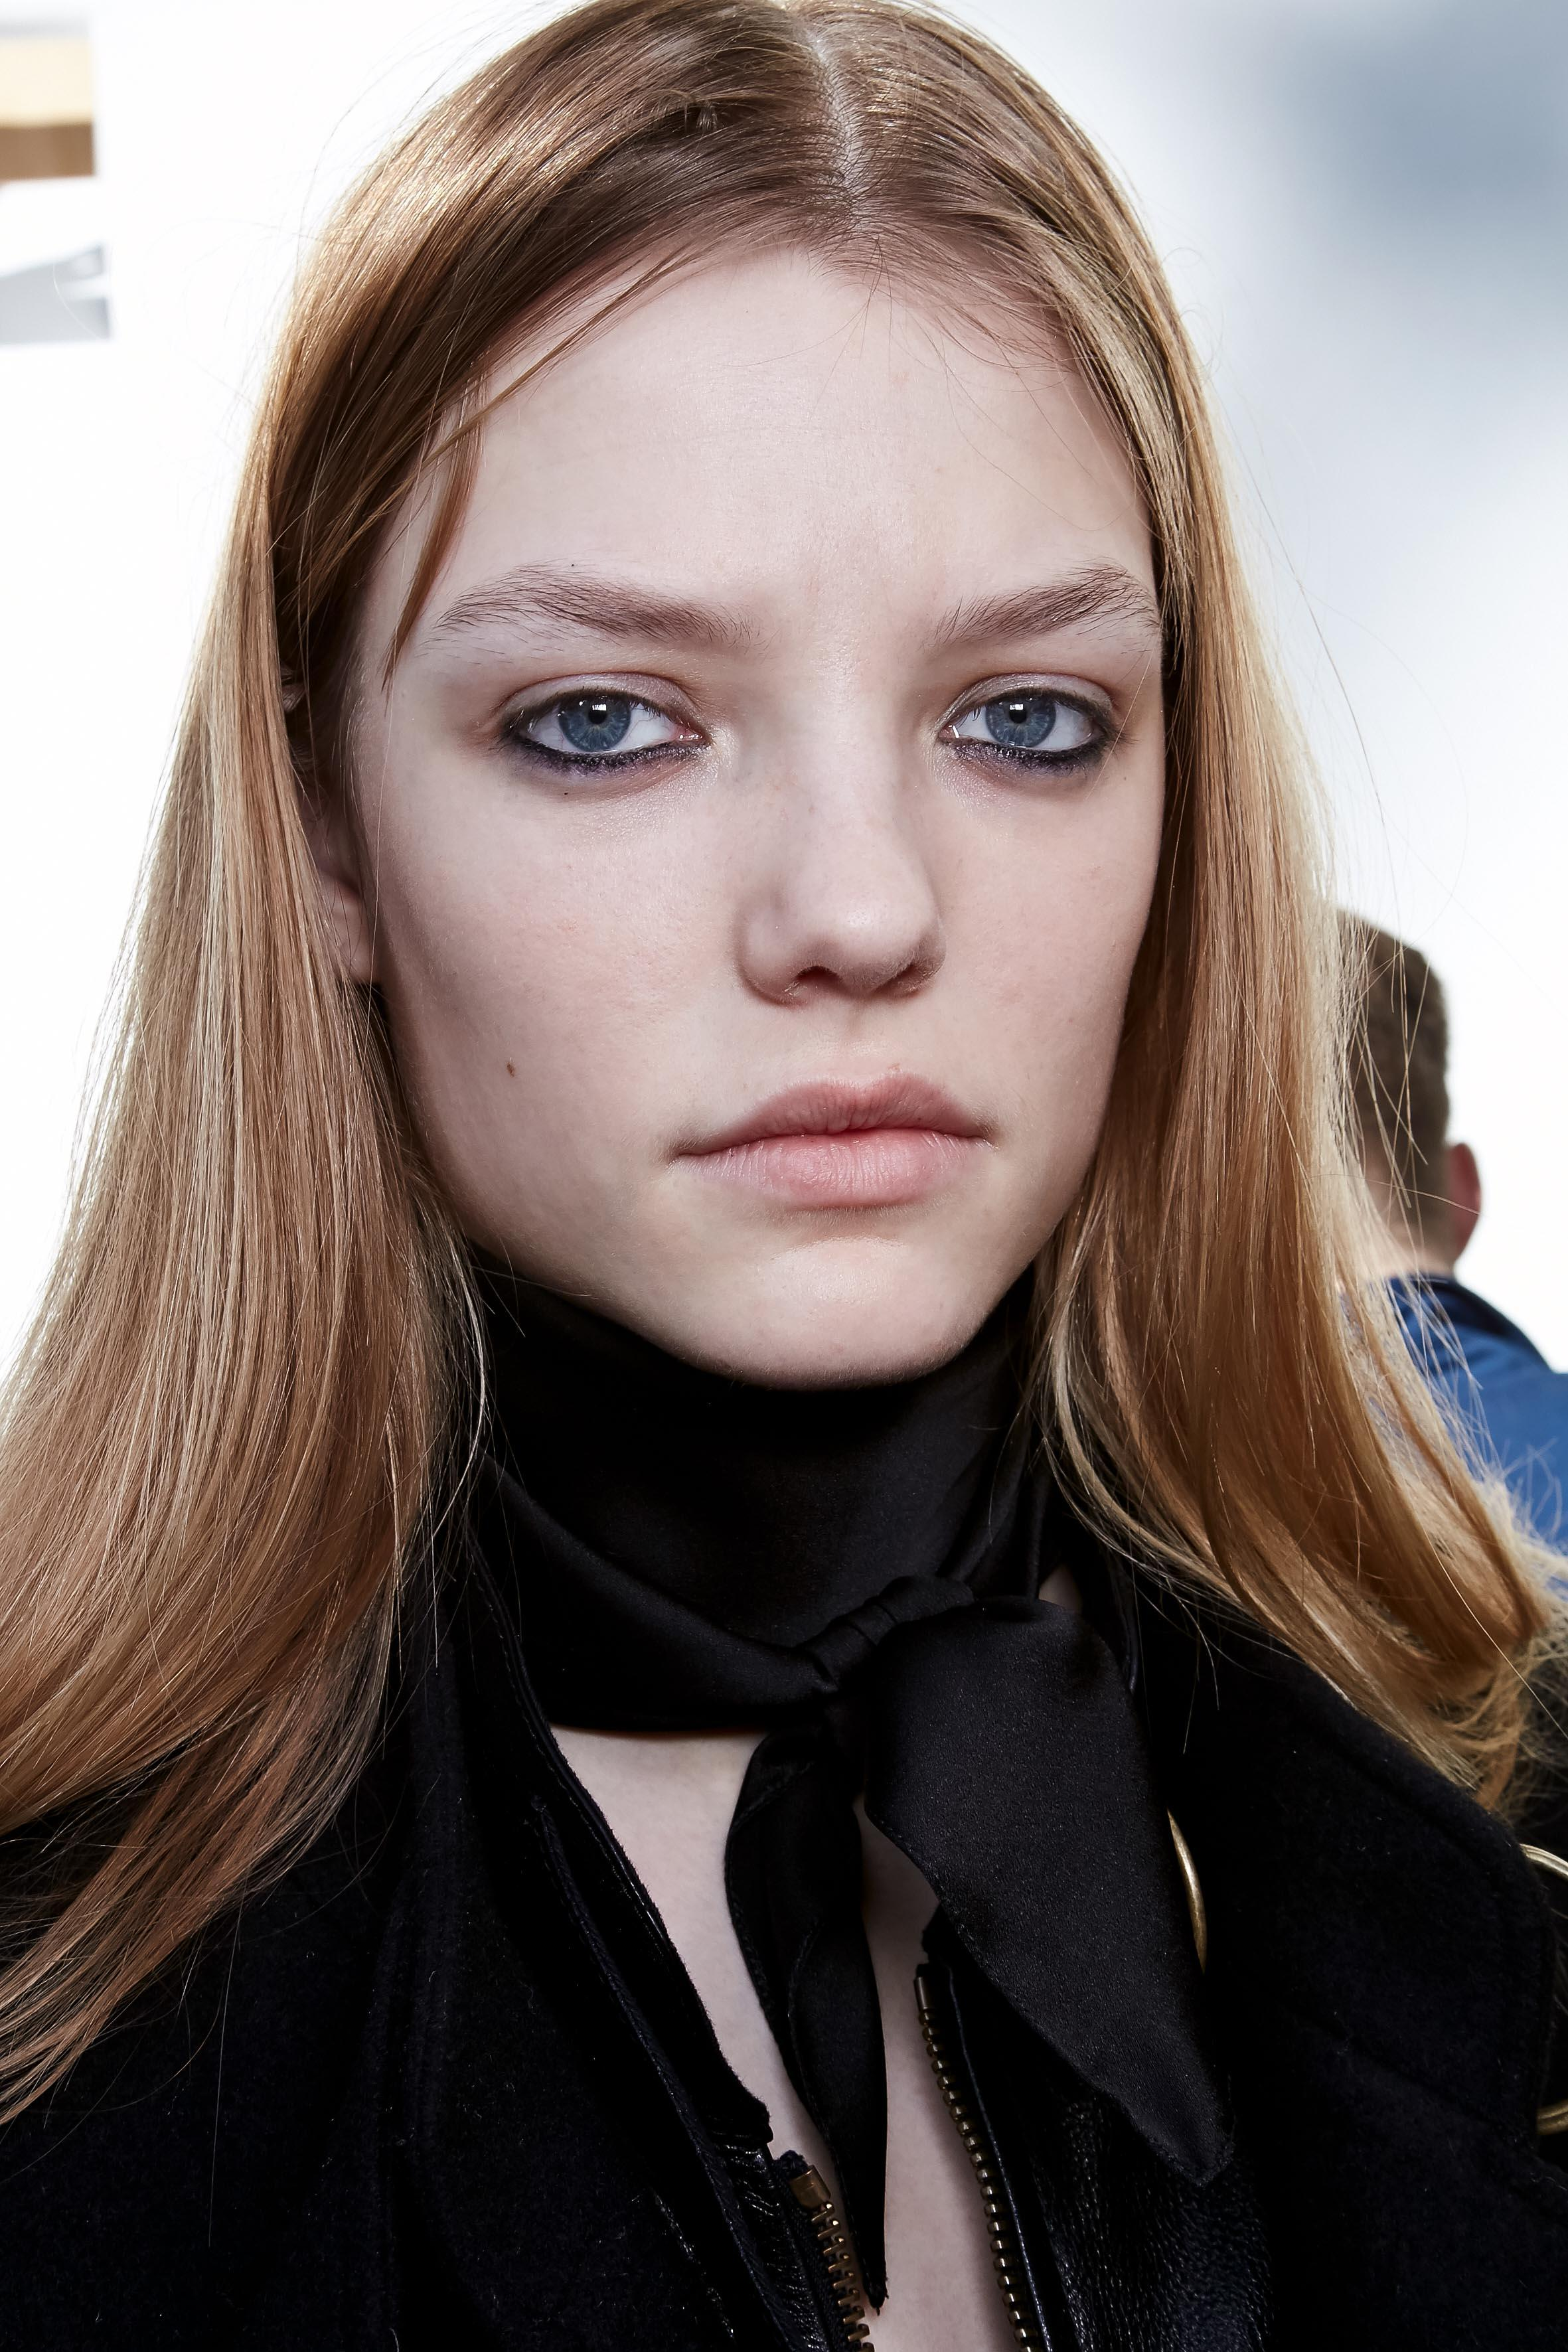 Herbst-Make-up-Trend: Nude Look bei Chloé